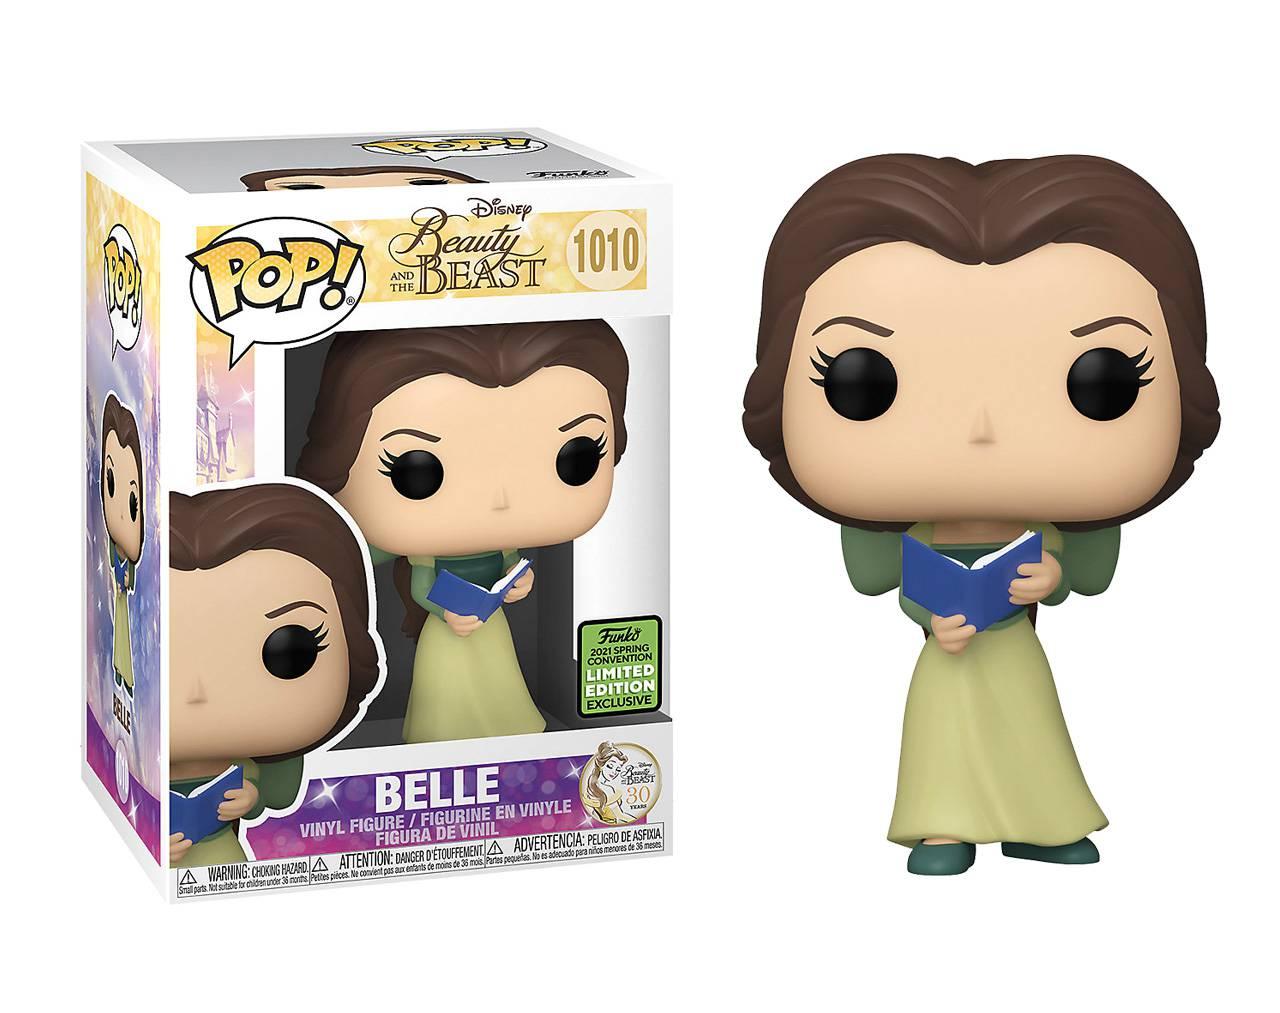 Belle (Geen dress & Book) Pop! Vinyl